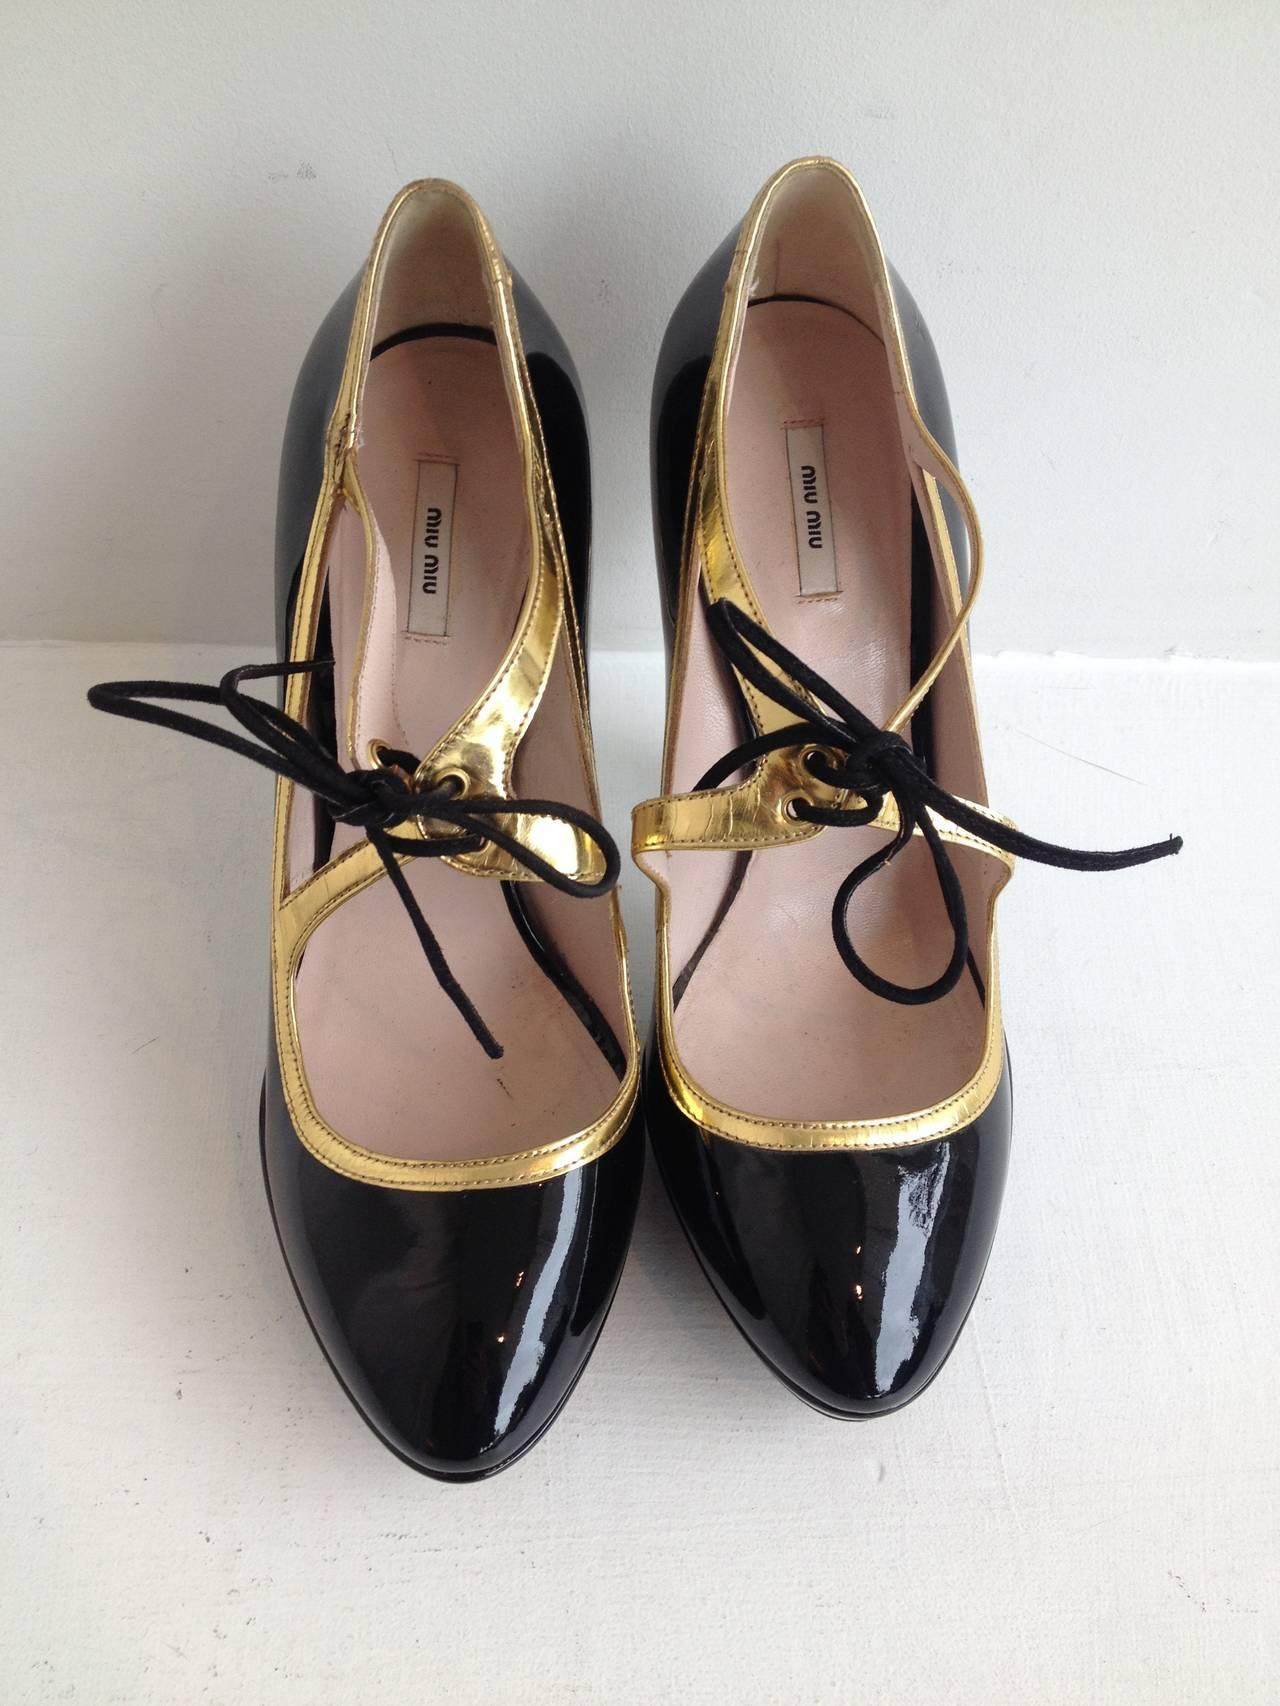 Miu Miu Black Patent Teacup Heels 2